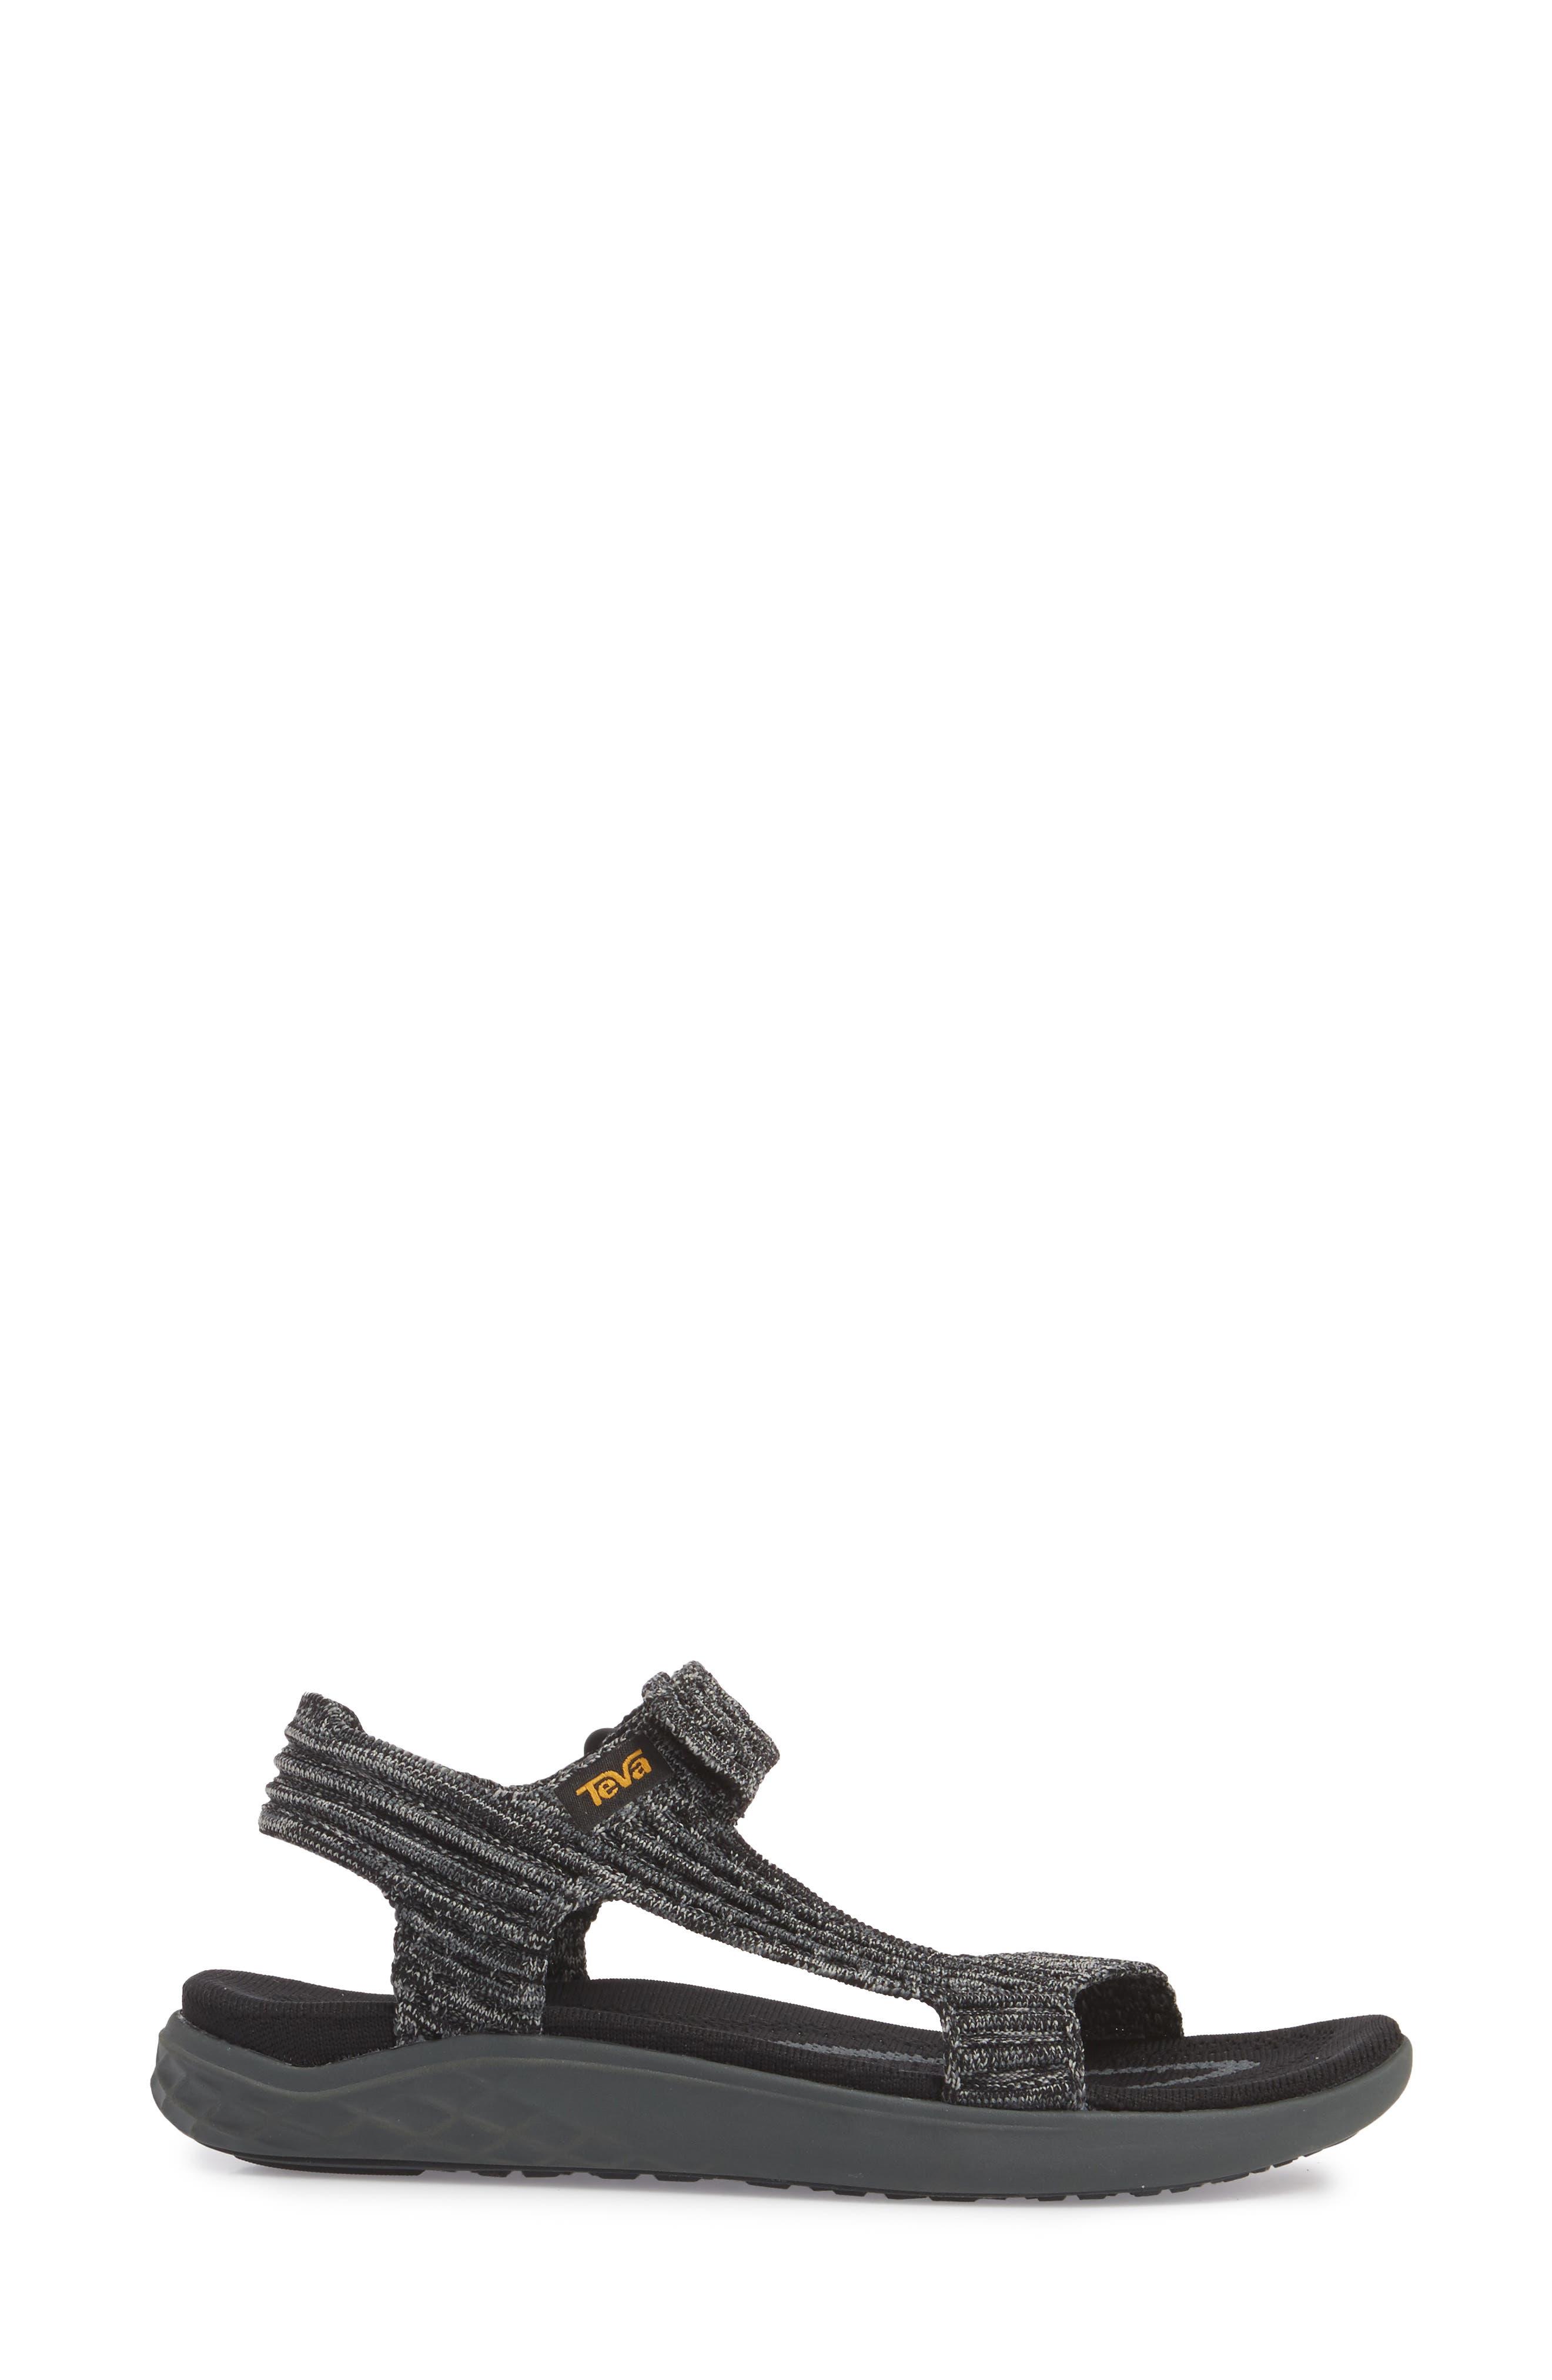 Terra Float 2 Knit Universal Sandal,                             Alternate thumbnail 9, color,